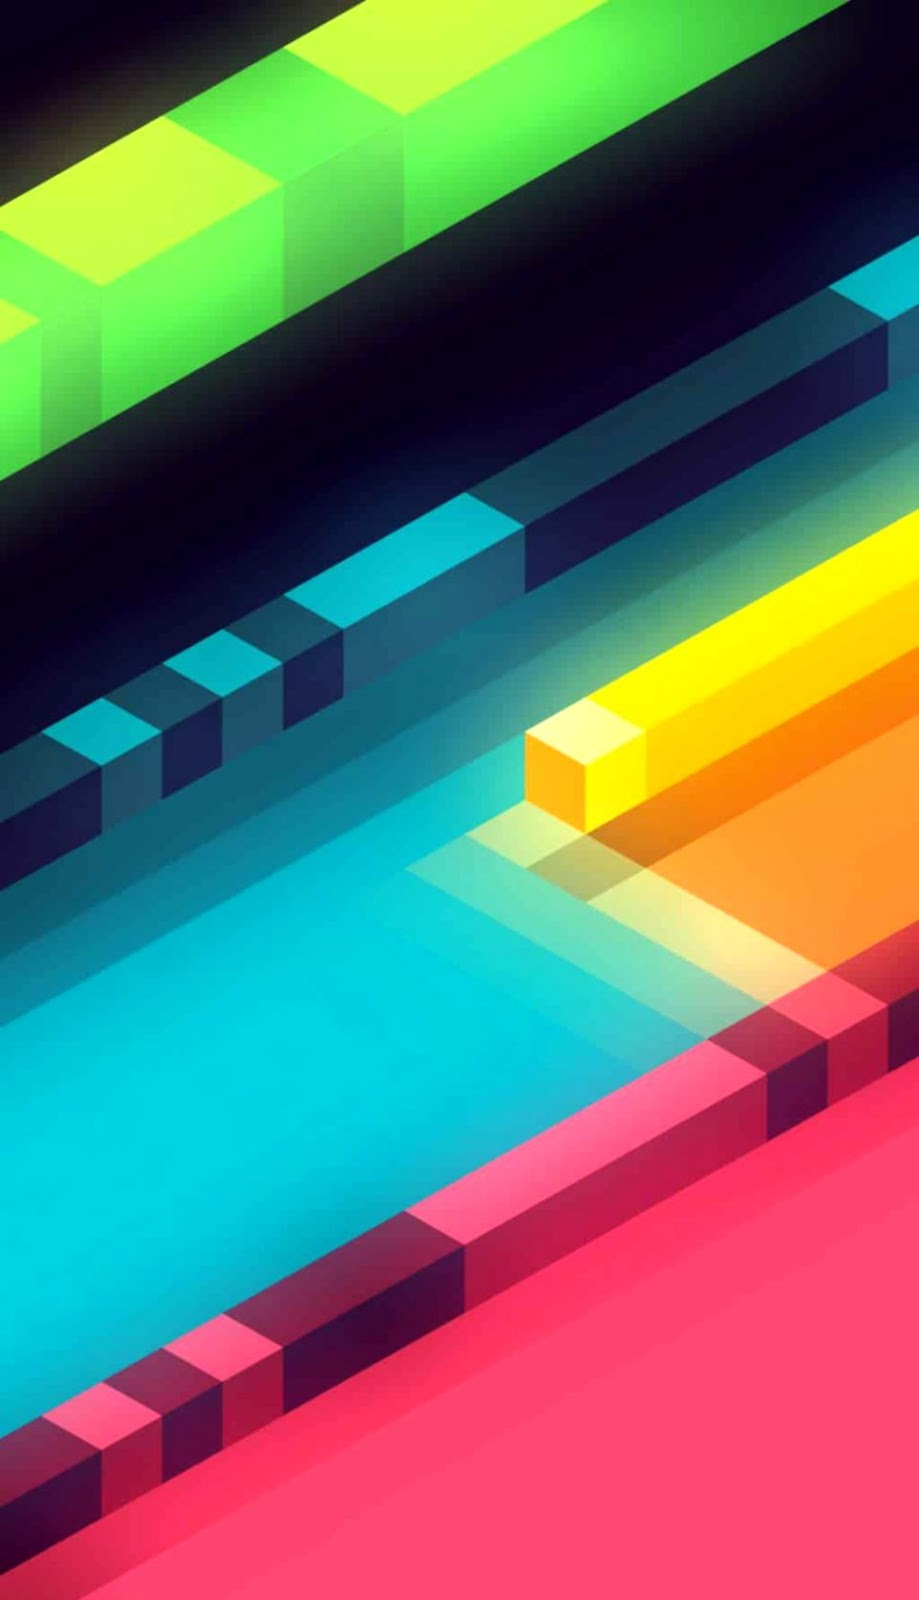 Colorful Diamond Shape Pattern Iphone 5 Wallpaper Its